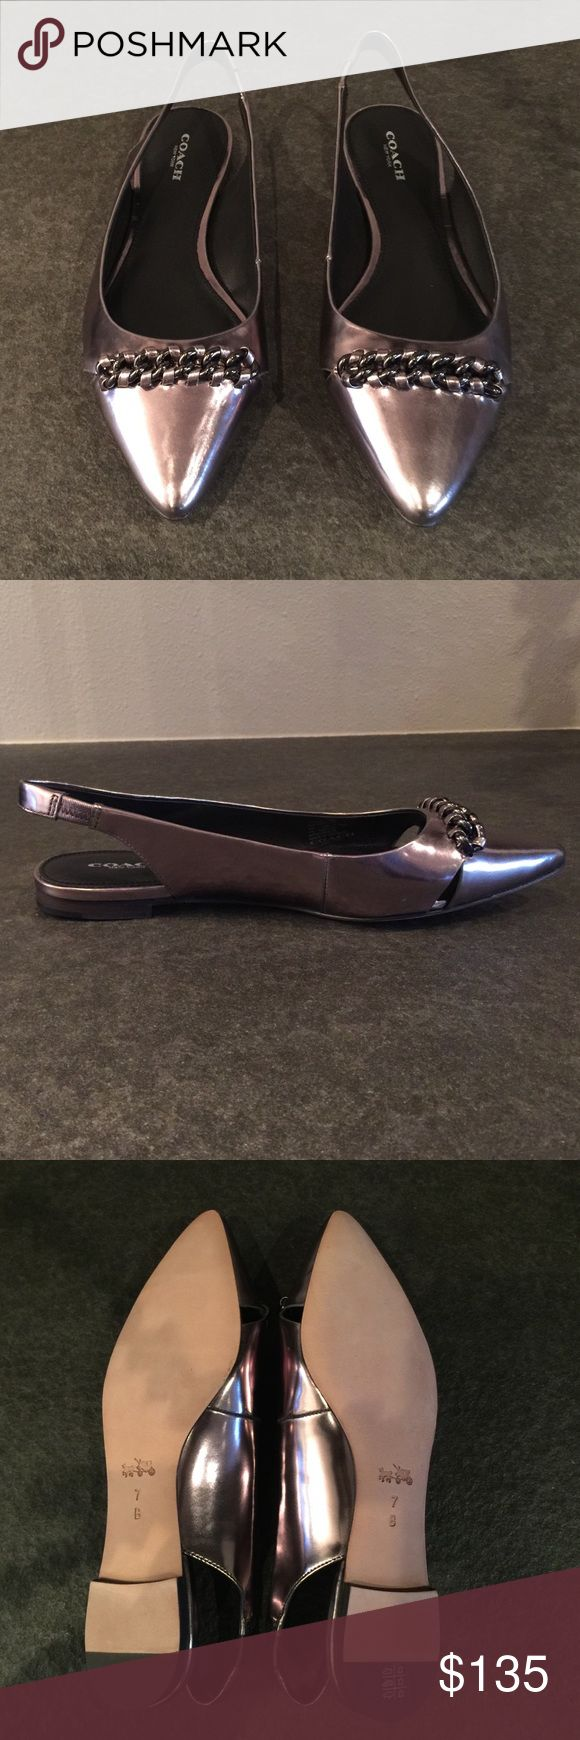 Coach Rodney Flat Slingback Shoes Coach Rodney Flat Slingback Shoes.  Size 7B, Color Warm Pewter.  NWT, Never Worn.  No trades. Coach Shoes Flats & Loafers